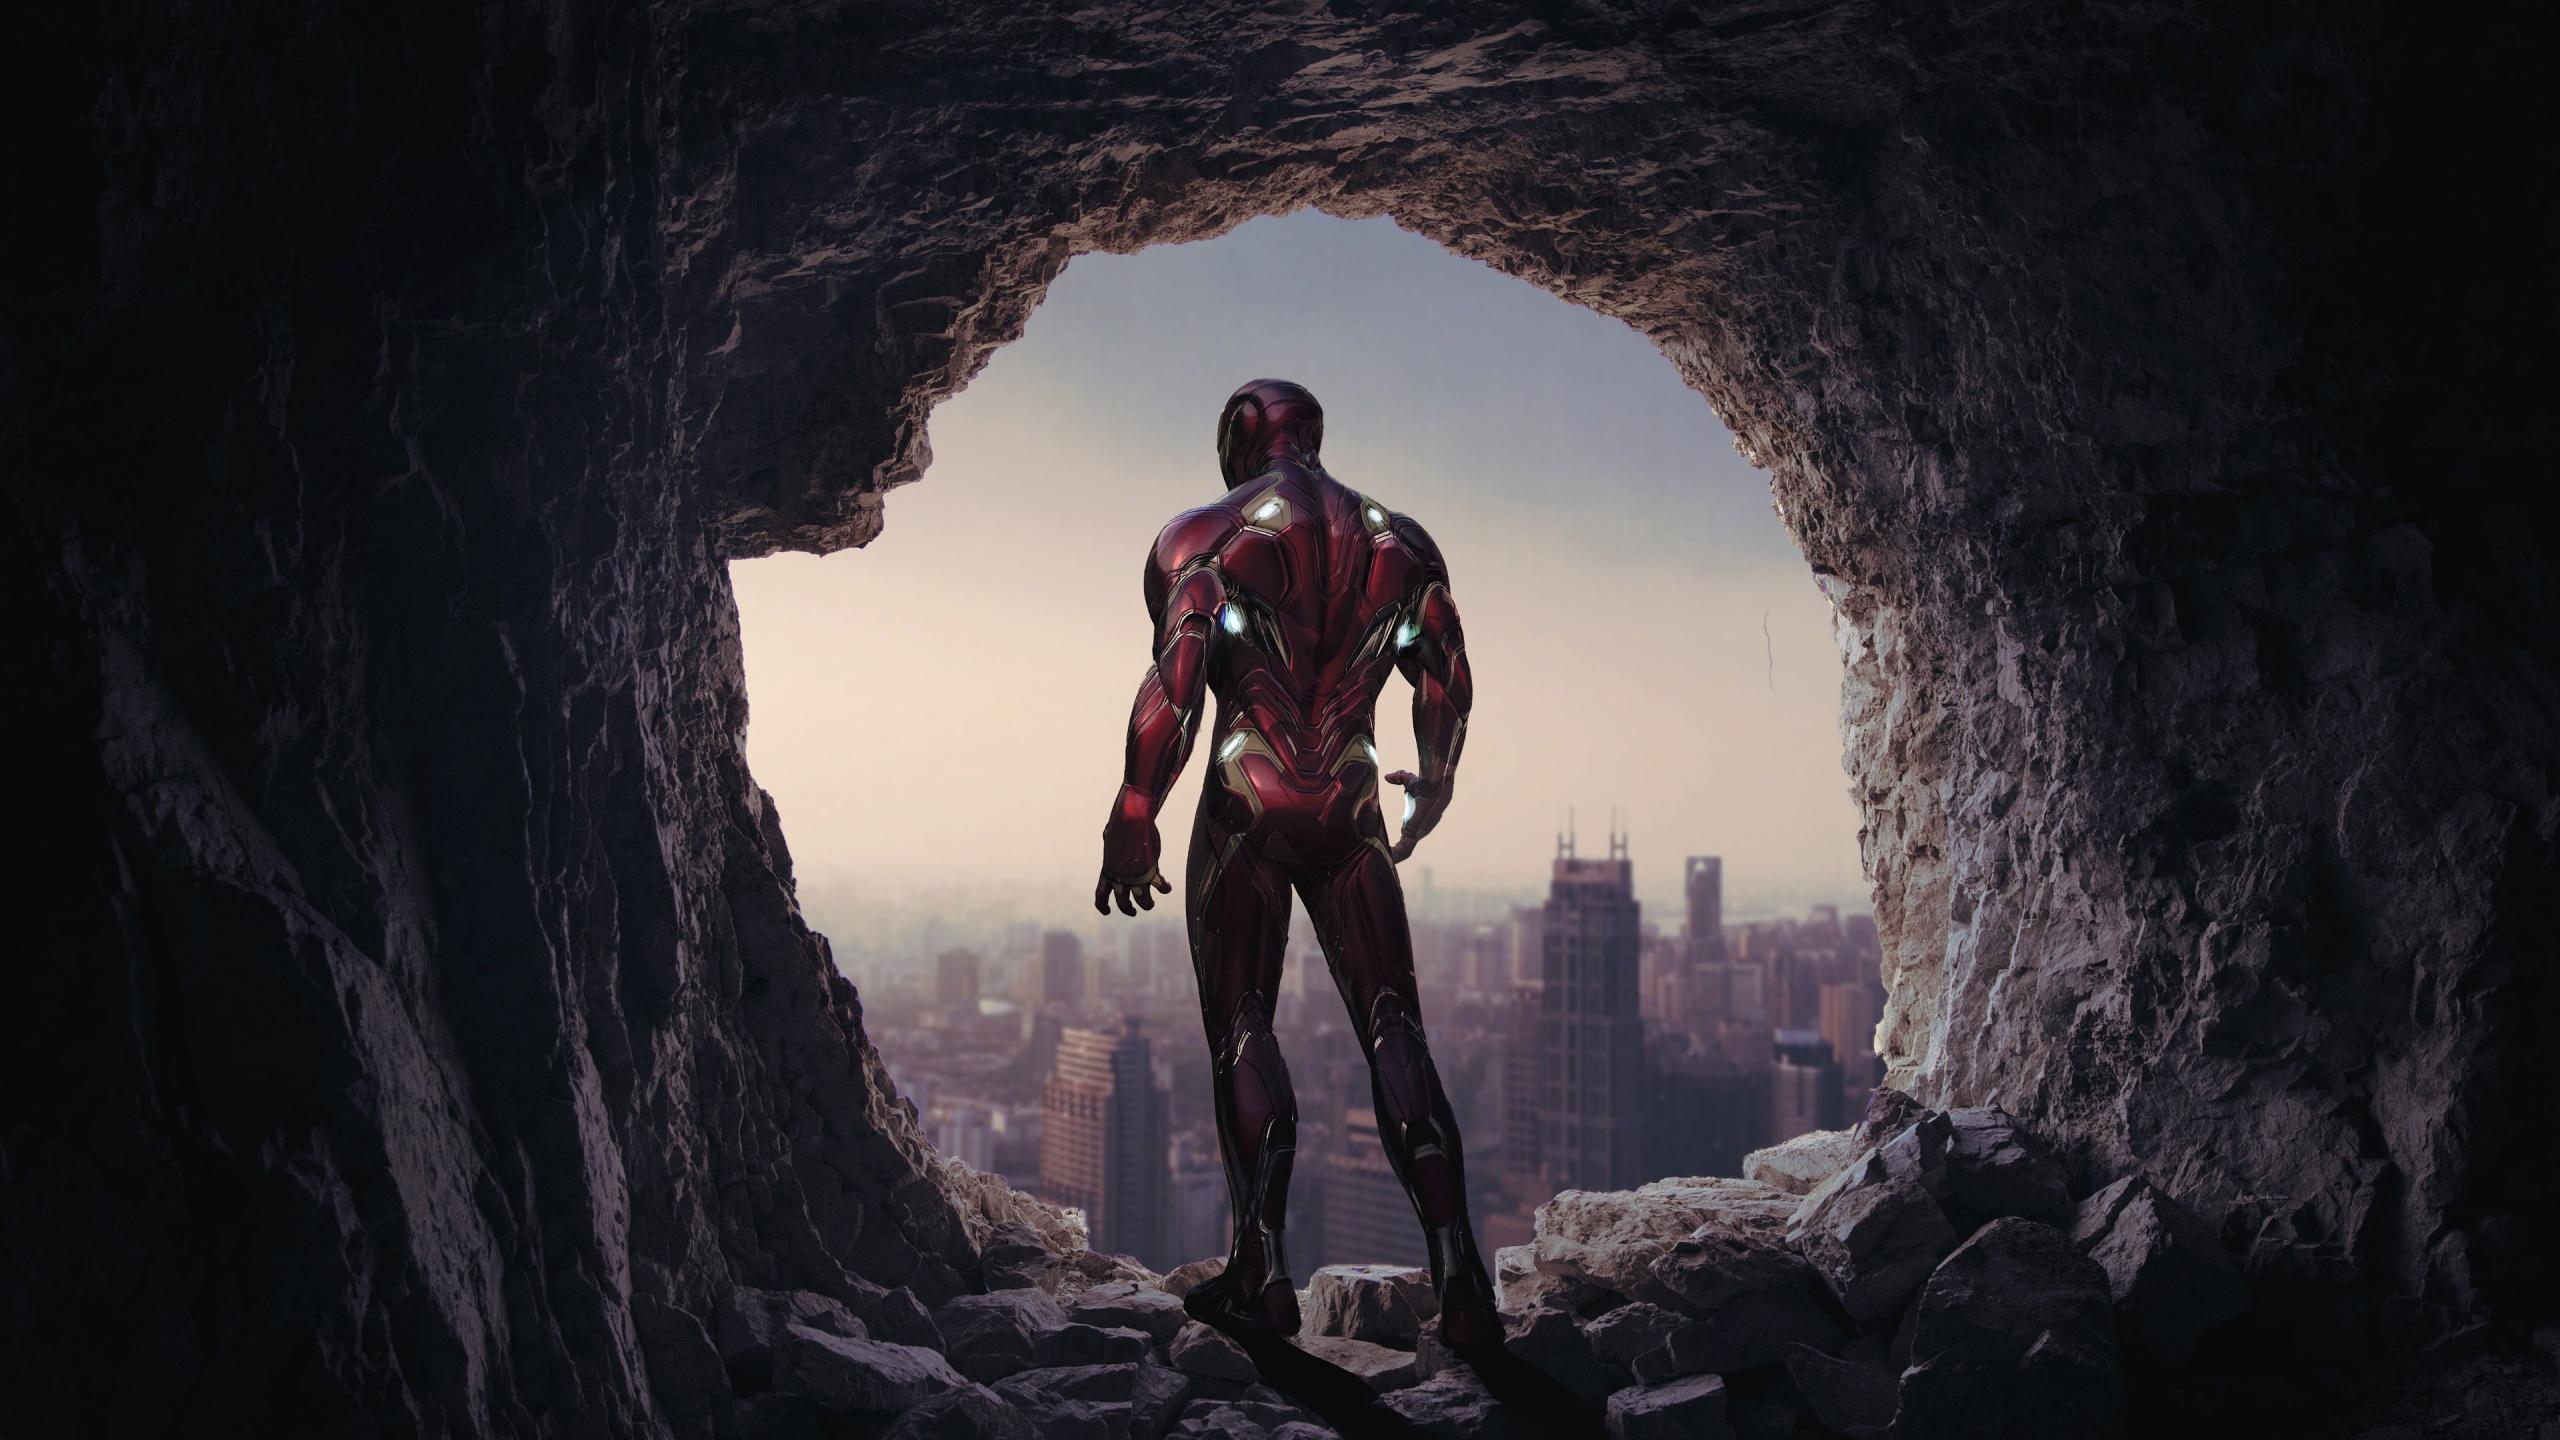 4k Wallpaper Iron Man Cave Time Travel Graphics Cgi 112